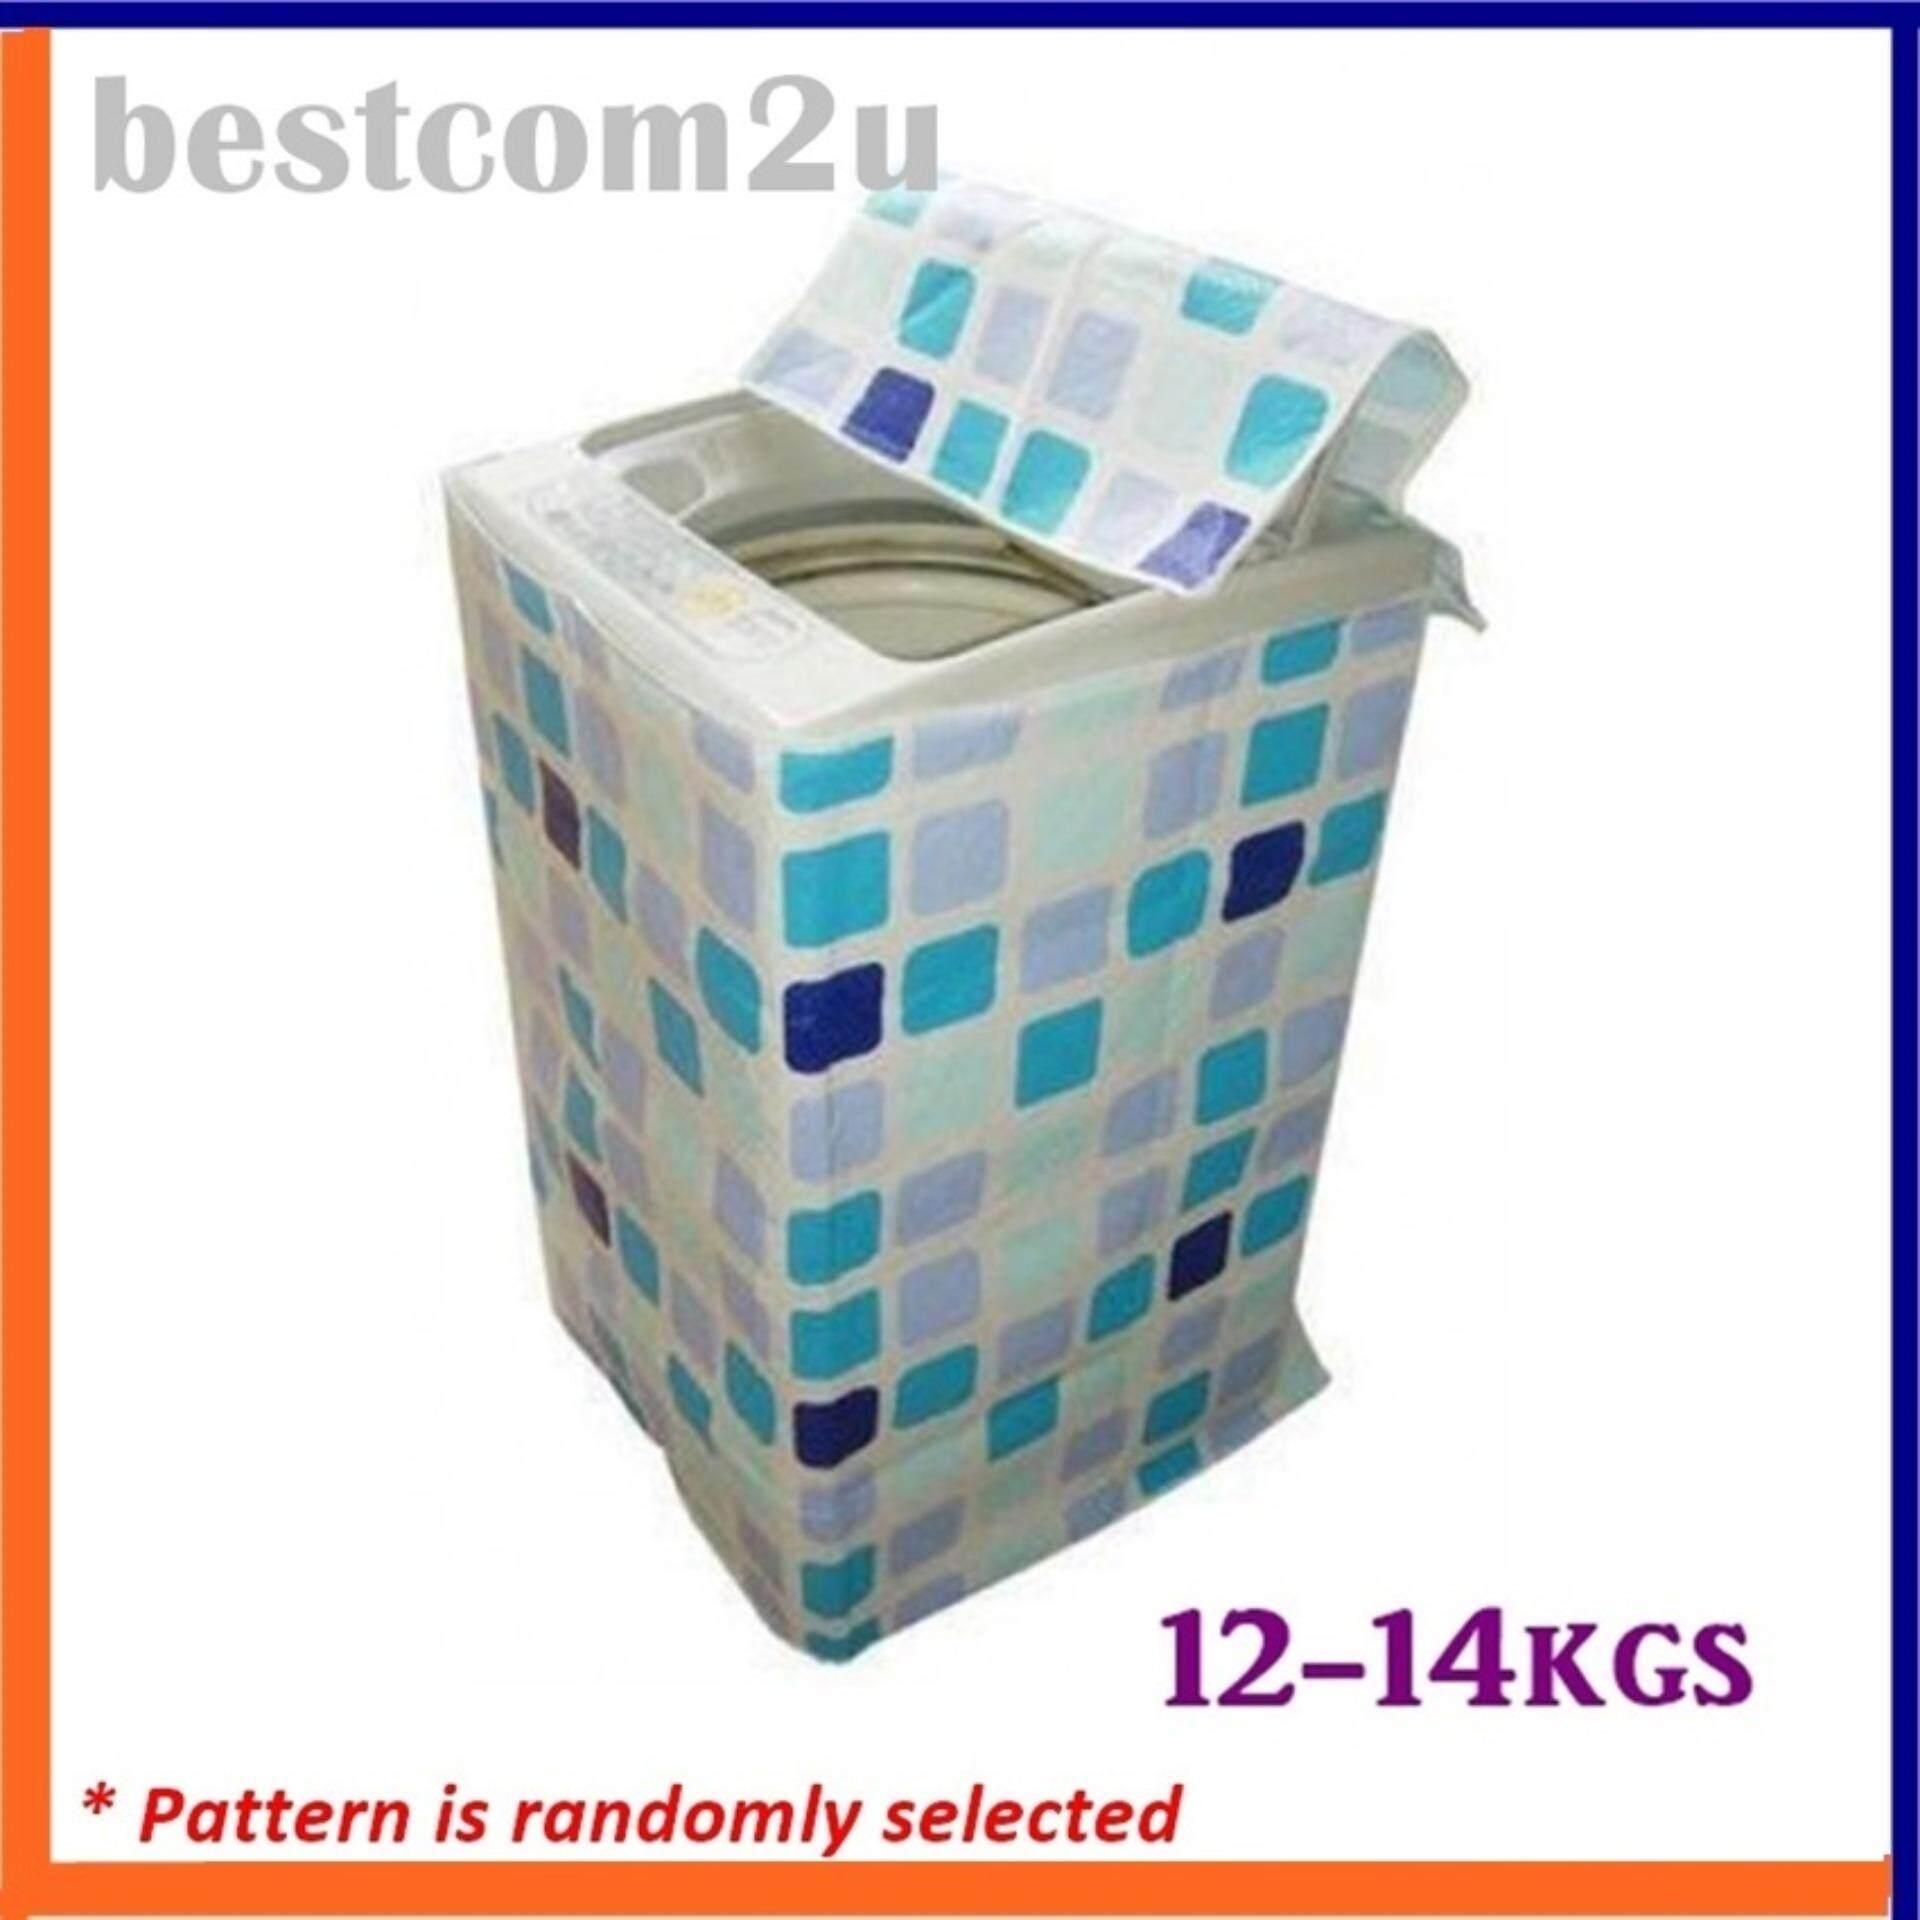 Acebell Washer Cover Twin-Ply Waterproof PVC Top Loading Washing Machine  Cover (12-24kgs) - BESTCOM2U